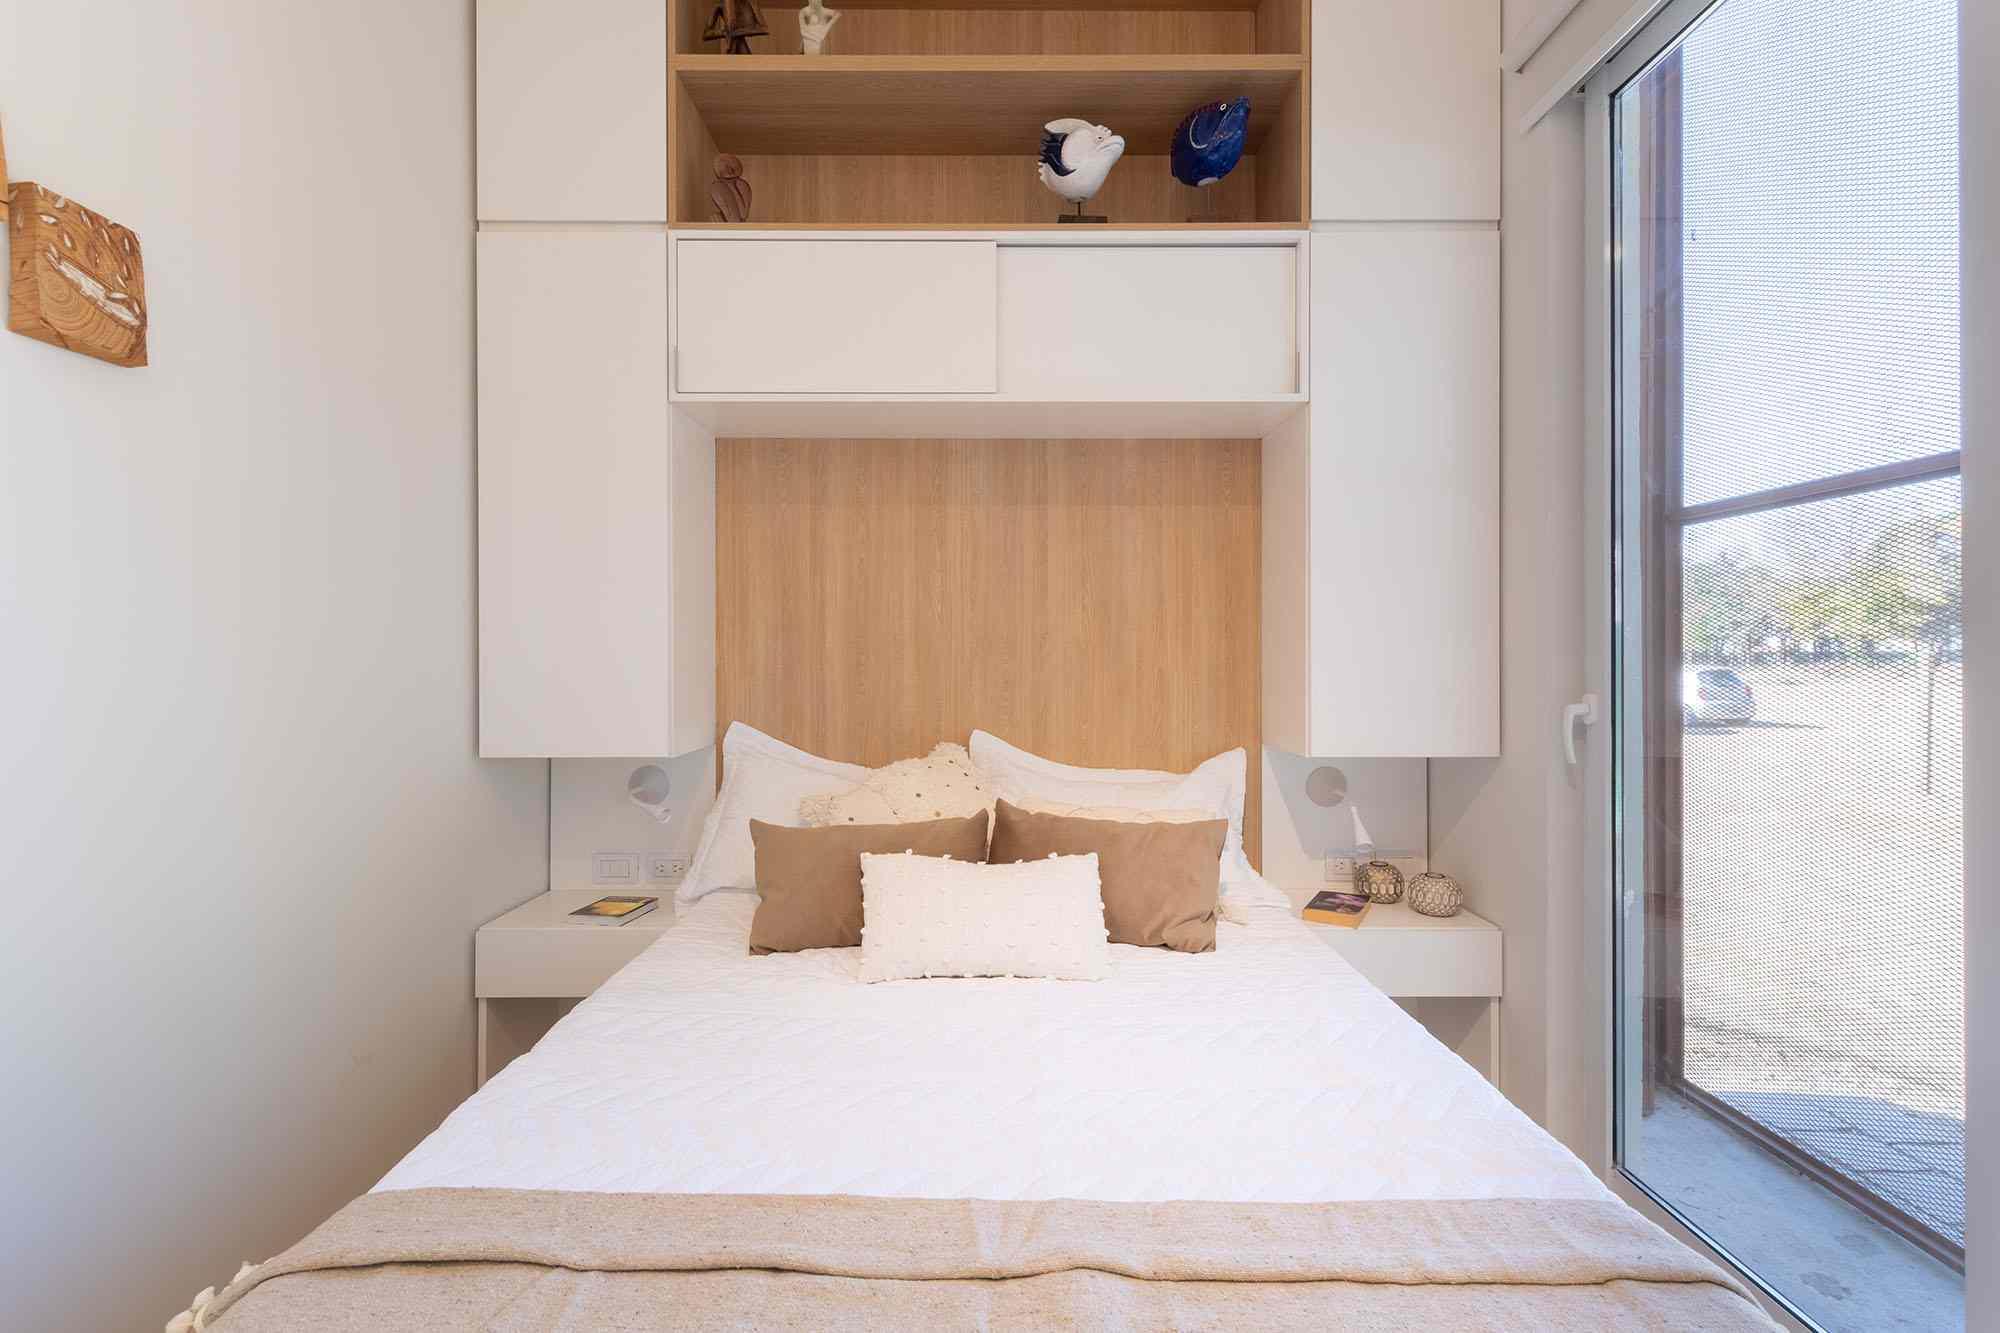 Hüga prefabricated house by Grandio master bedroom